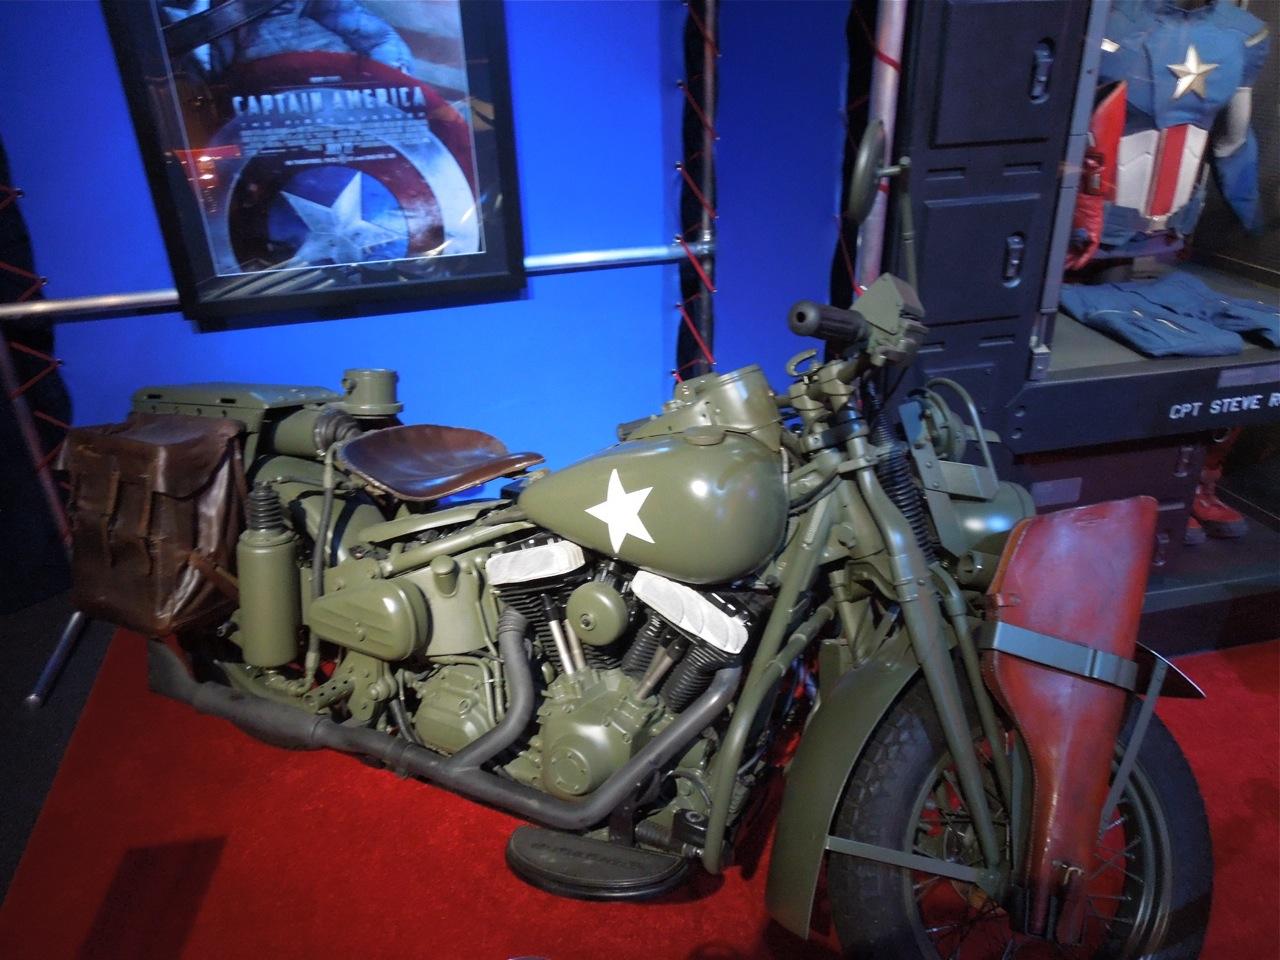 http://4.bp.blogspot.com/-H6R-O5psmLw/UDQNxlvbZBI/AAAAAAAAxOY/iPZvpbbvCBA/s1600/steverogers%2Bmotorcycle%2Bcaptainamerica.jpg